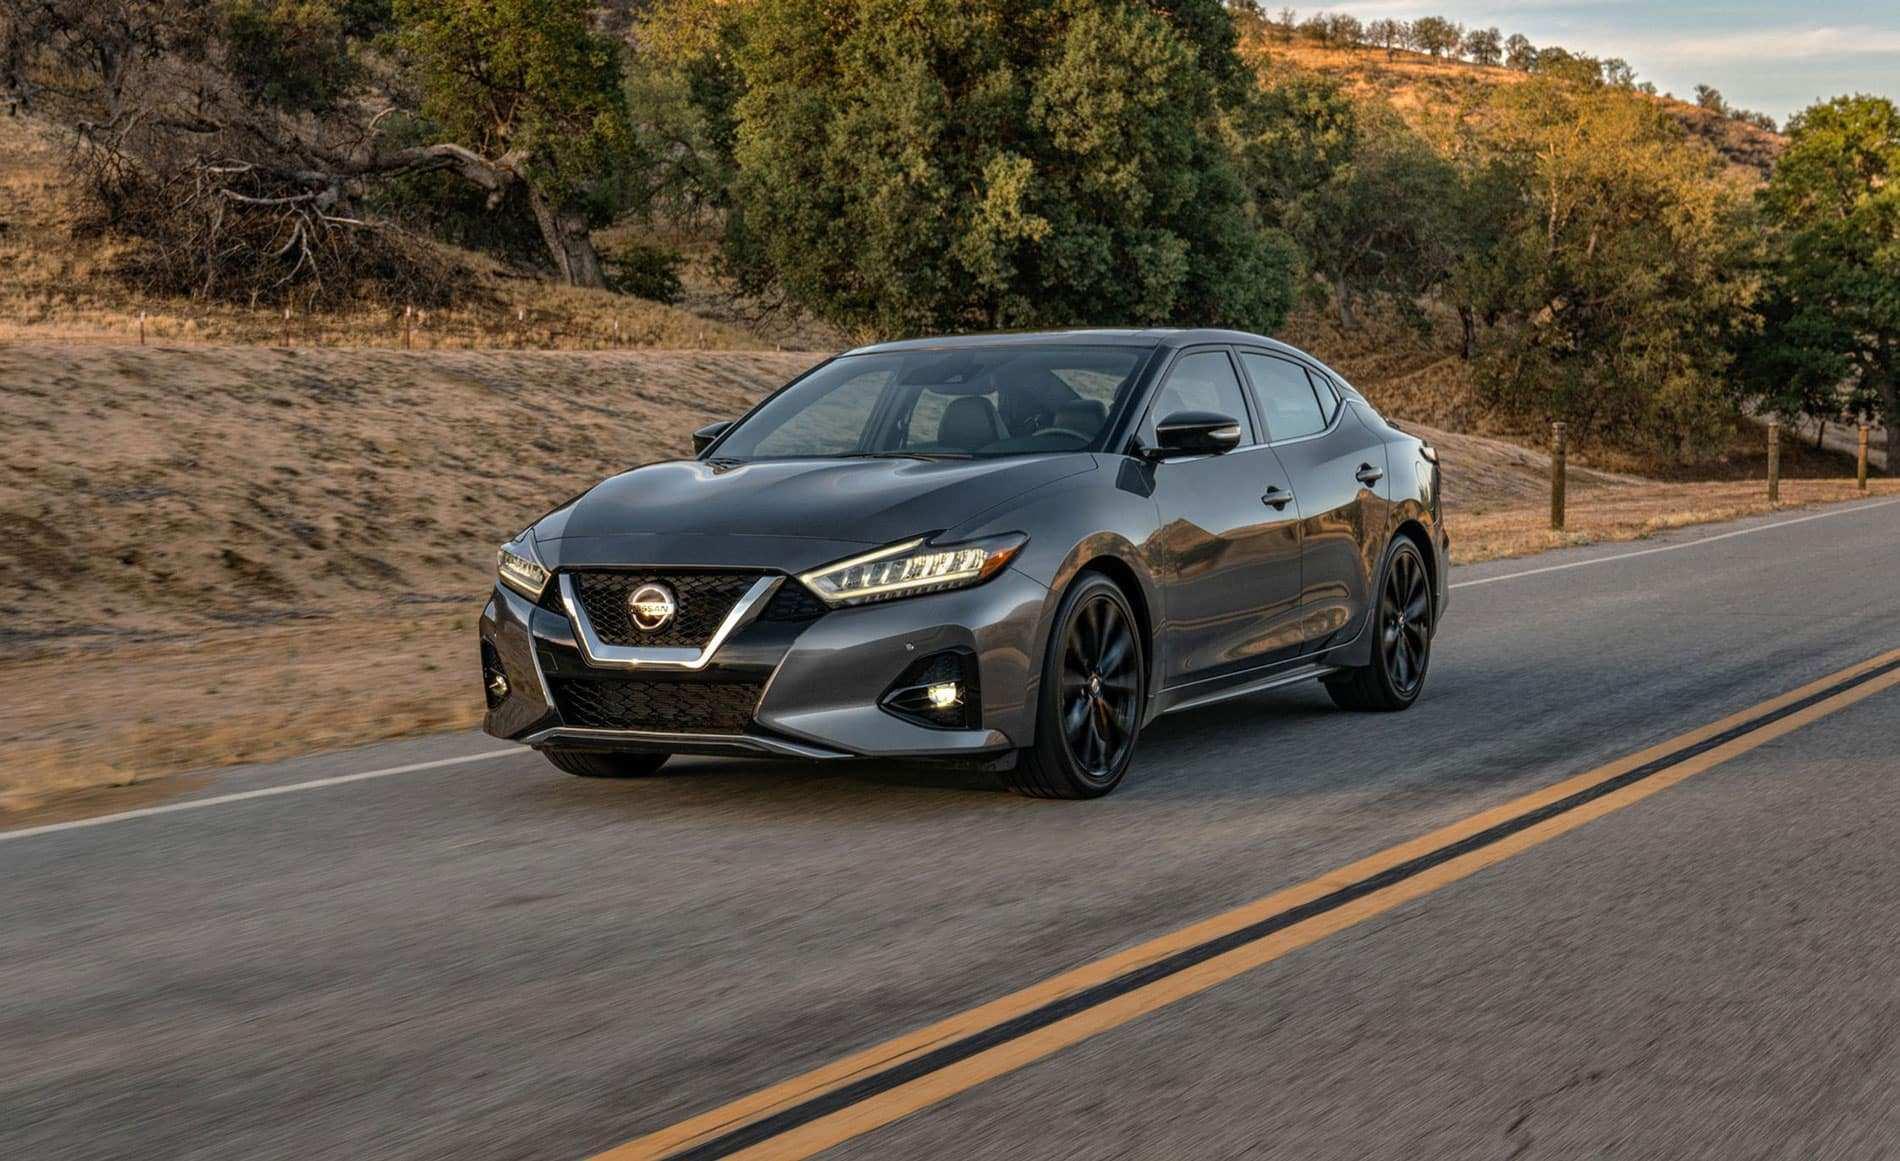 51 Concept of 2019 Nissan Maxima Specs for 2019 Nissan Maxima